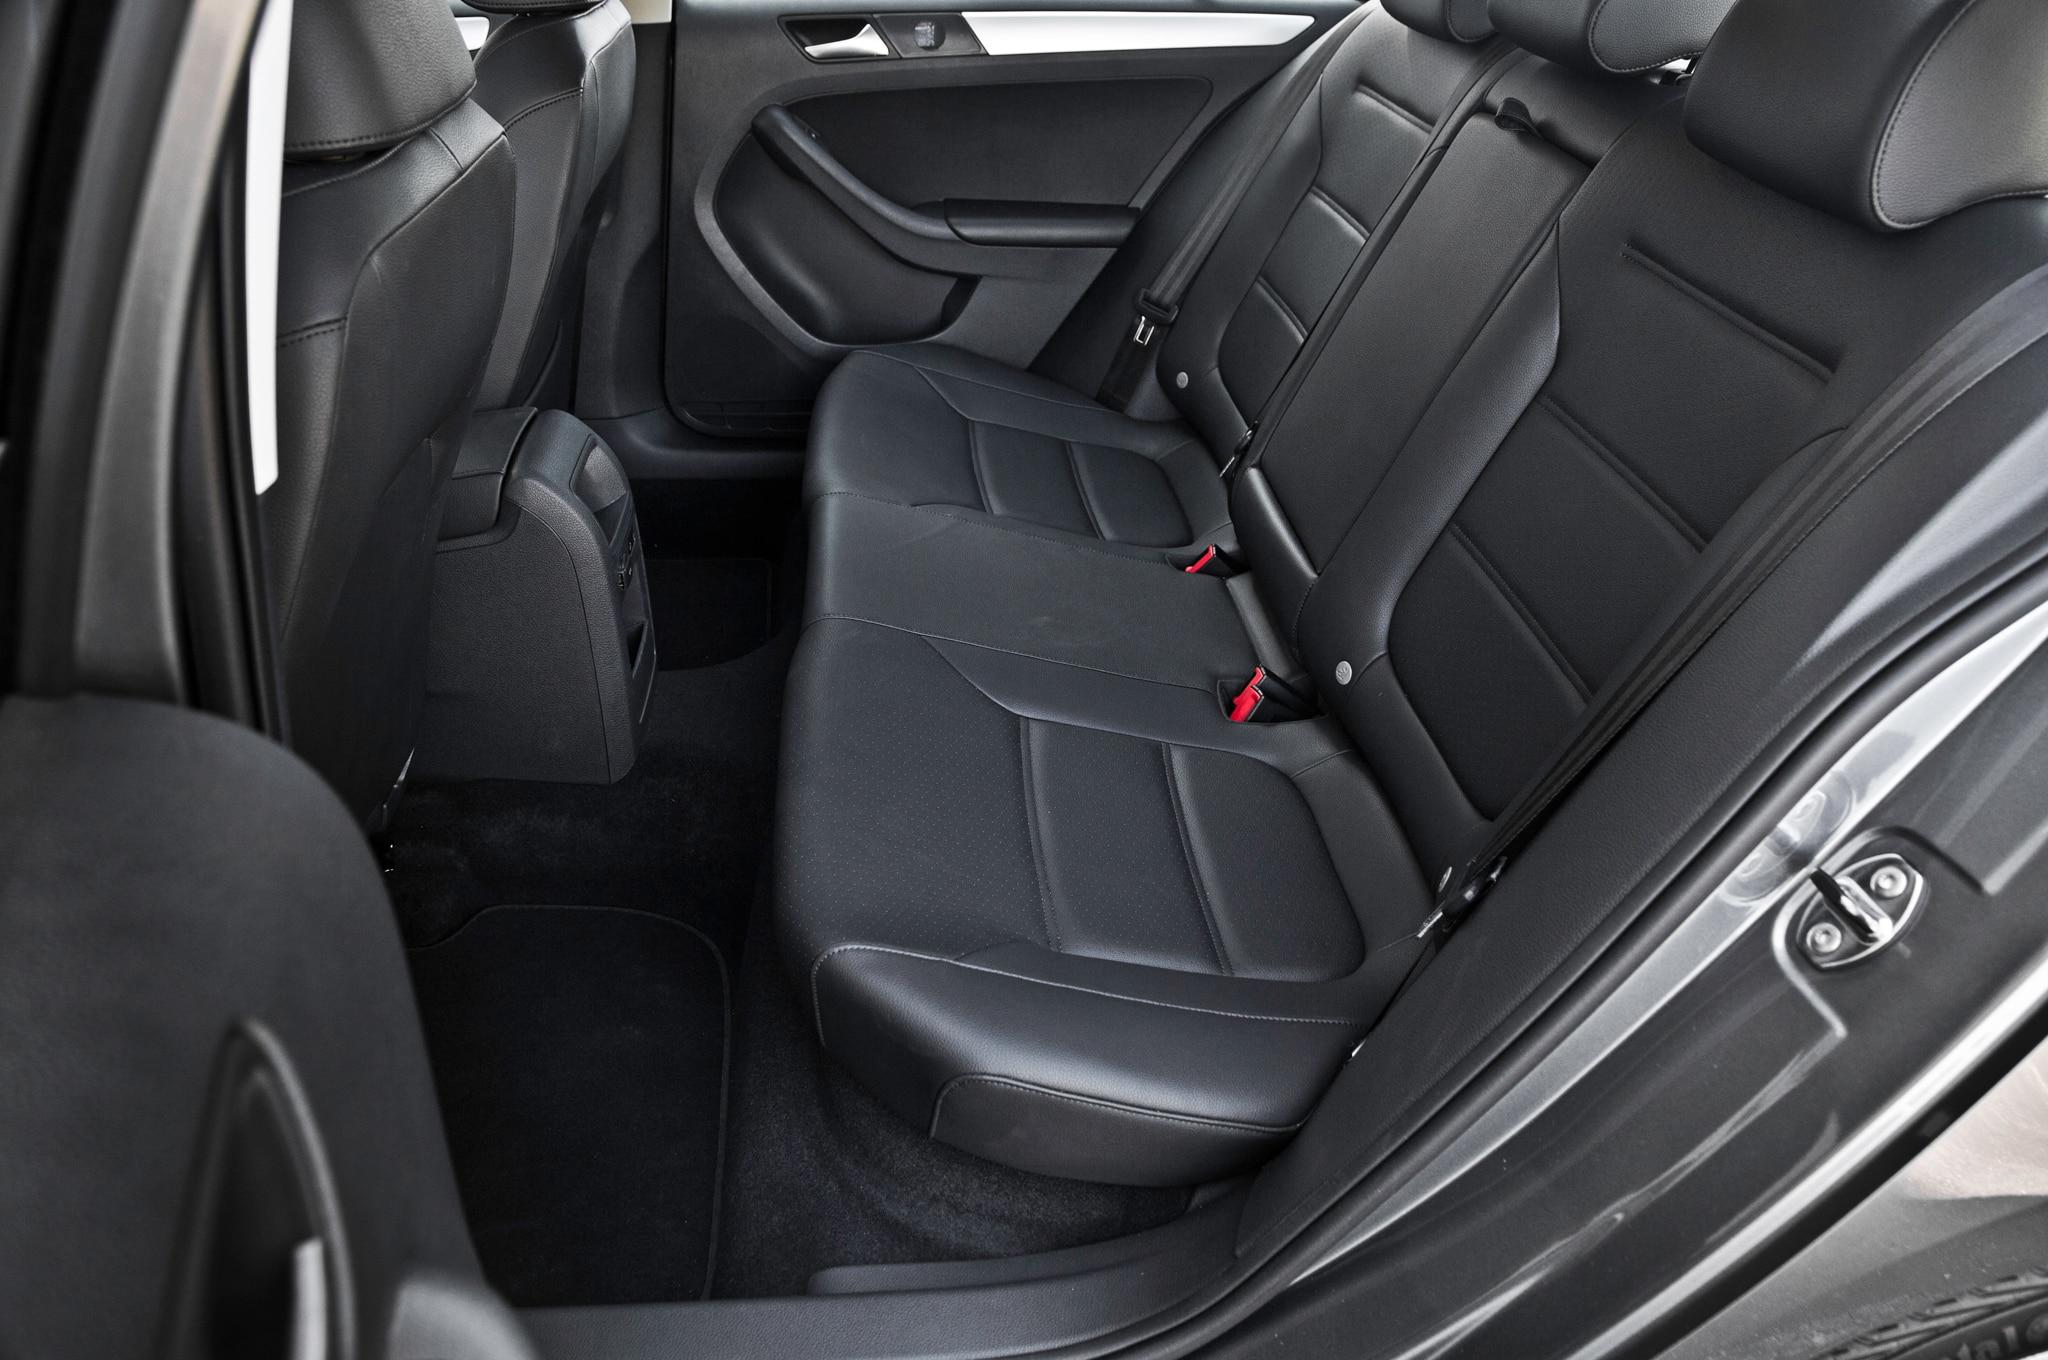 volkswagen t roc concept debuts in geneva automobile. Black Bedroom Furniture Sets. Home Design Ideas